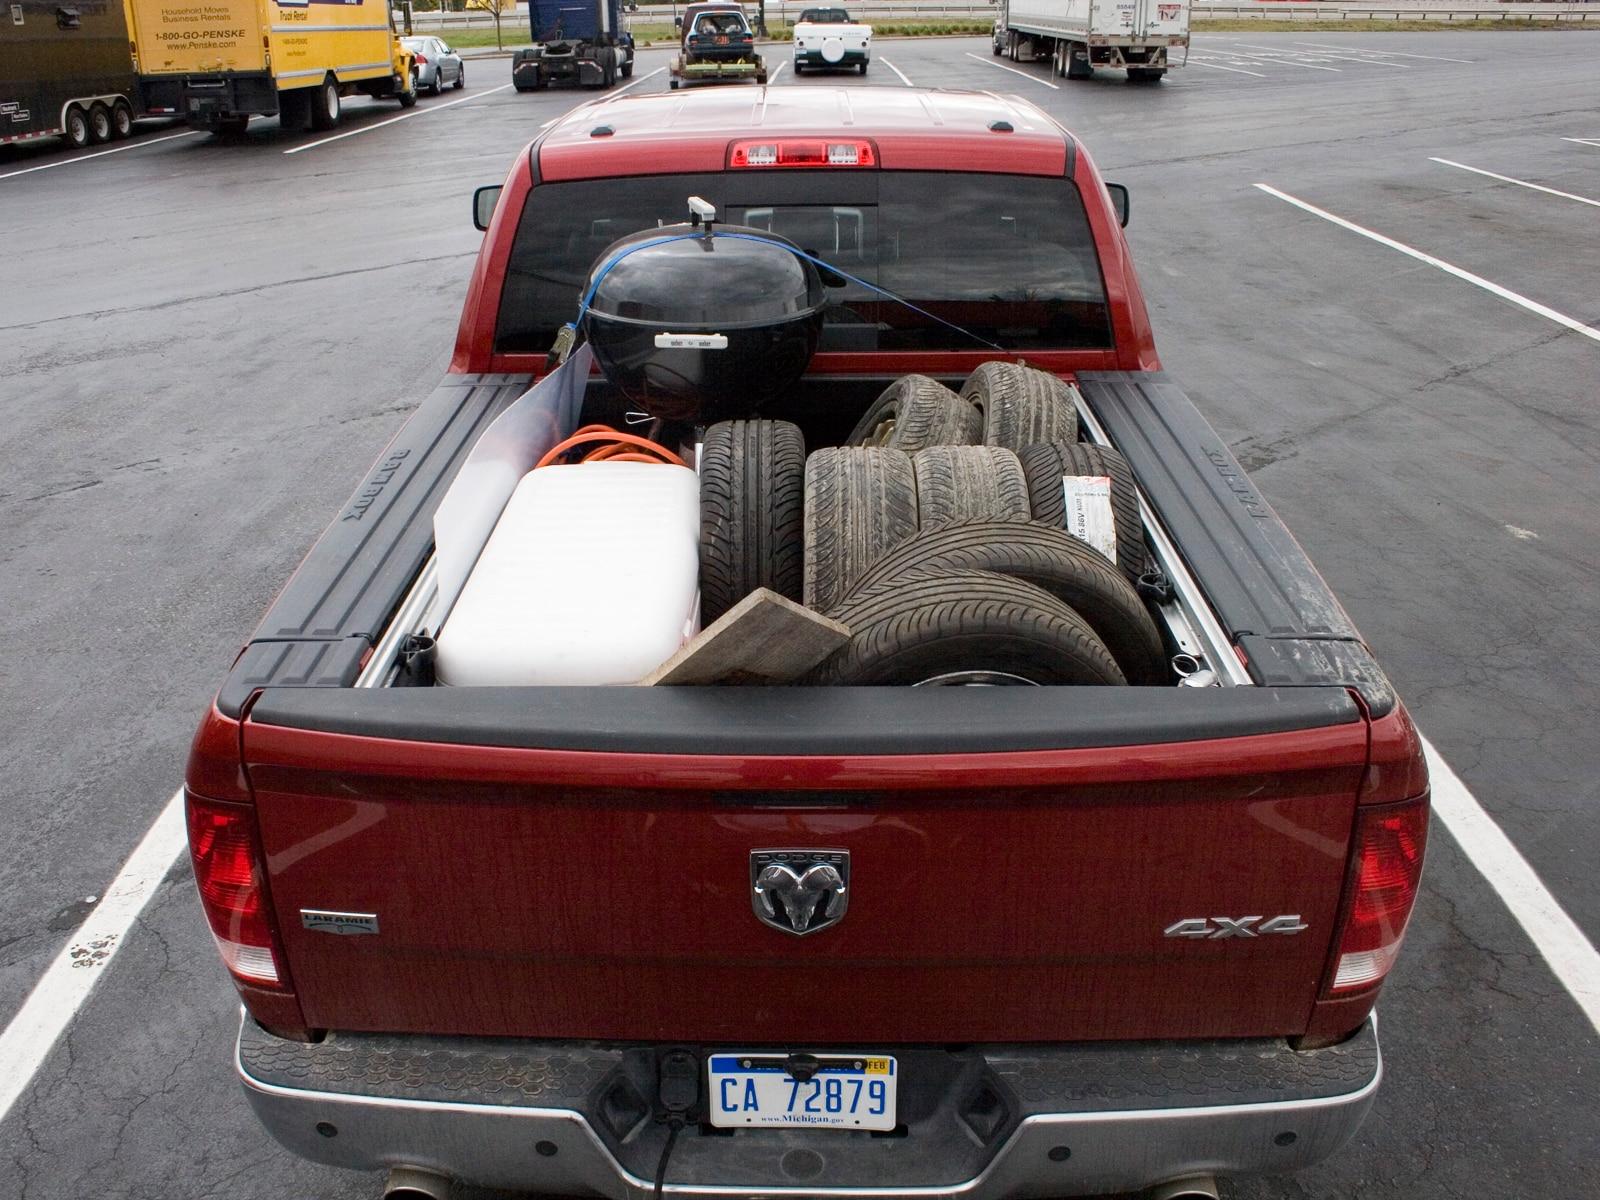 0910 03 Z 2009 Dodge Ram 1500 Rear View